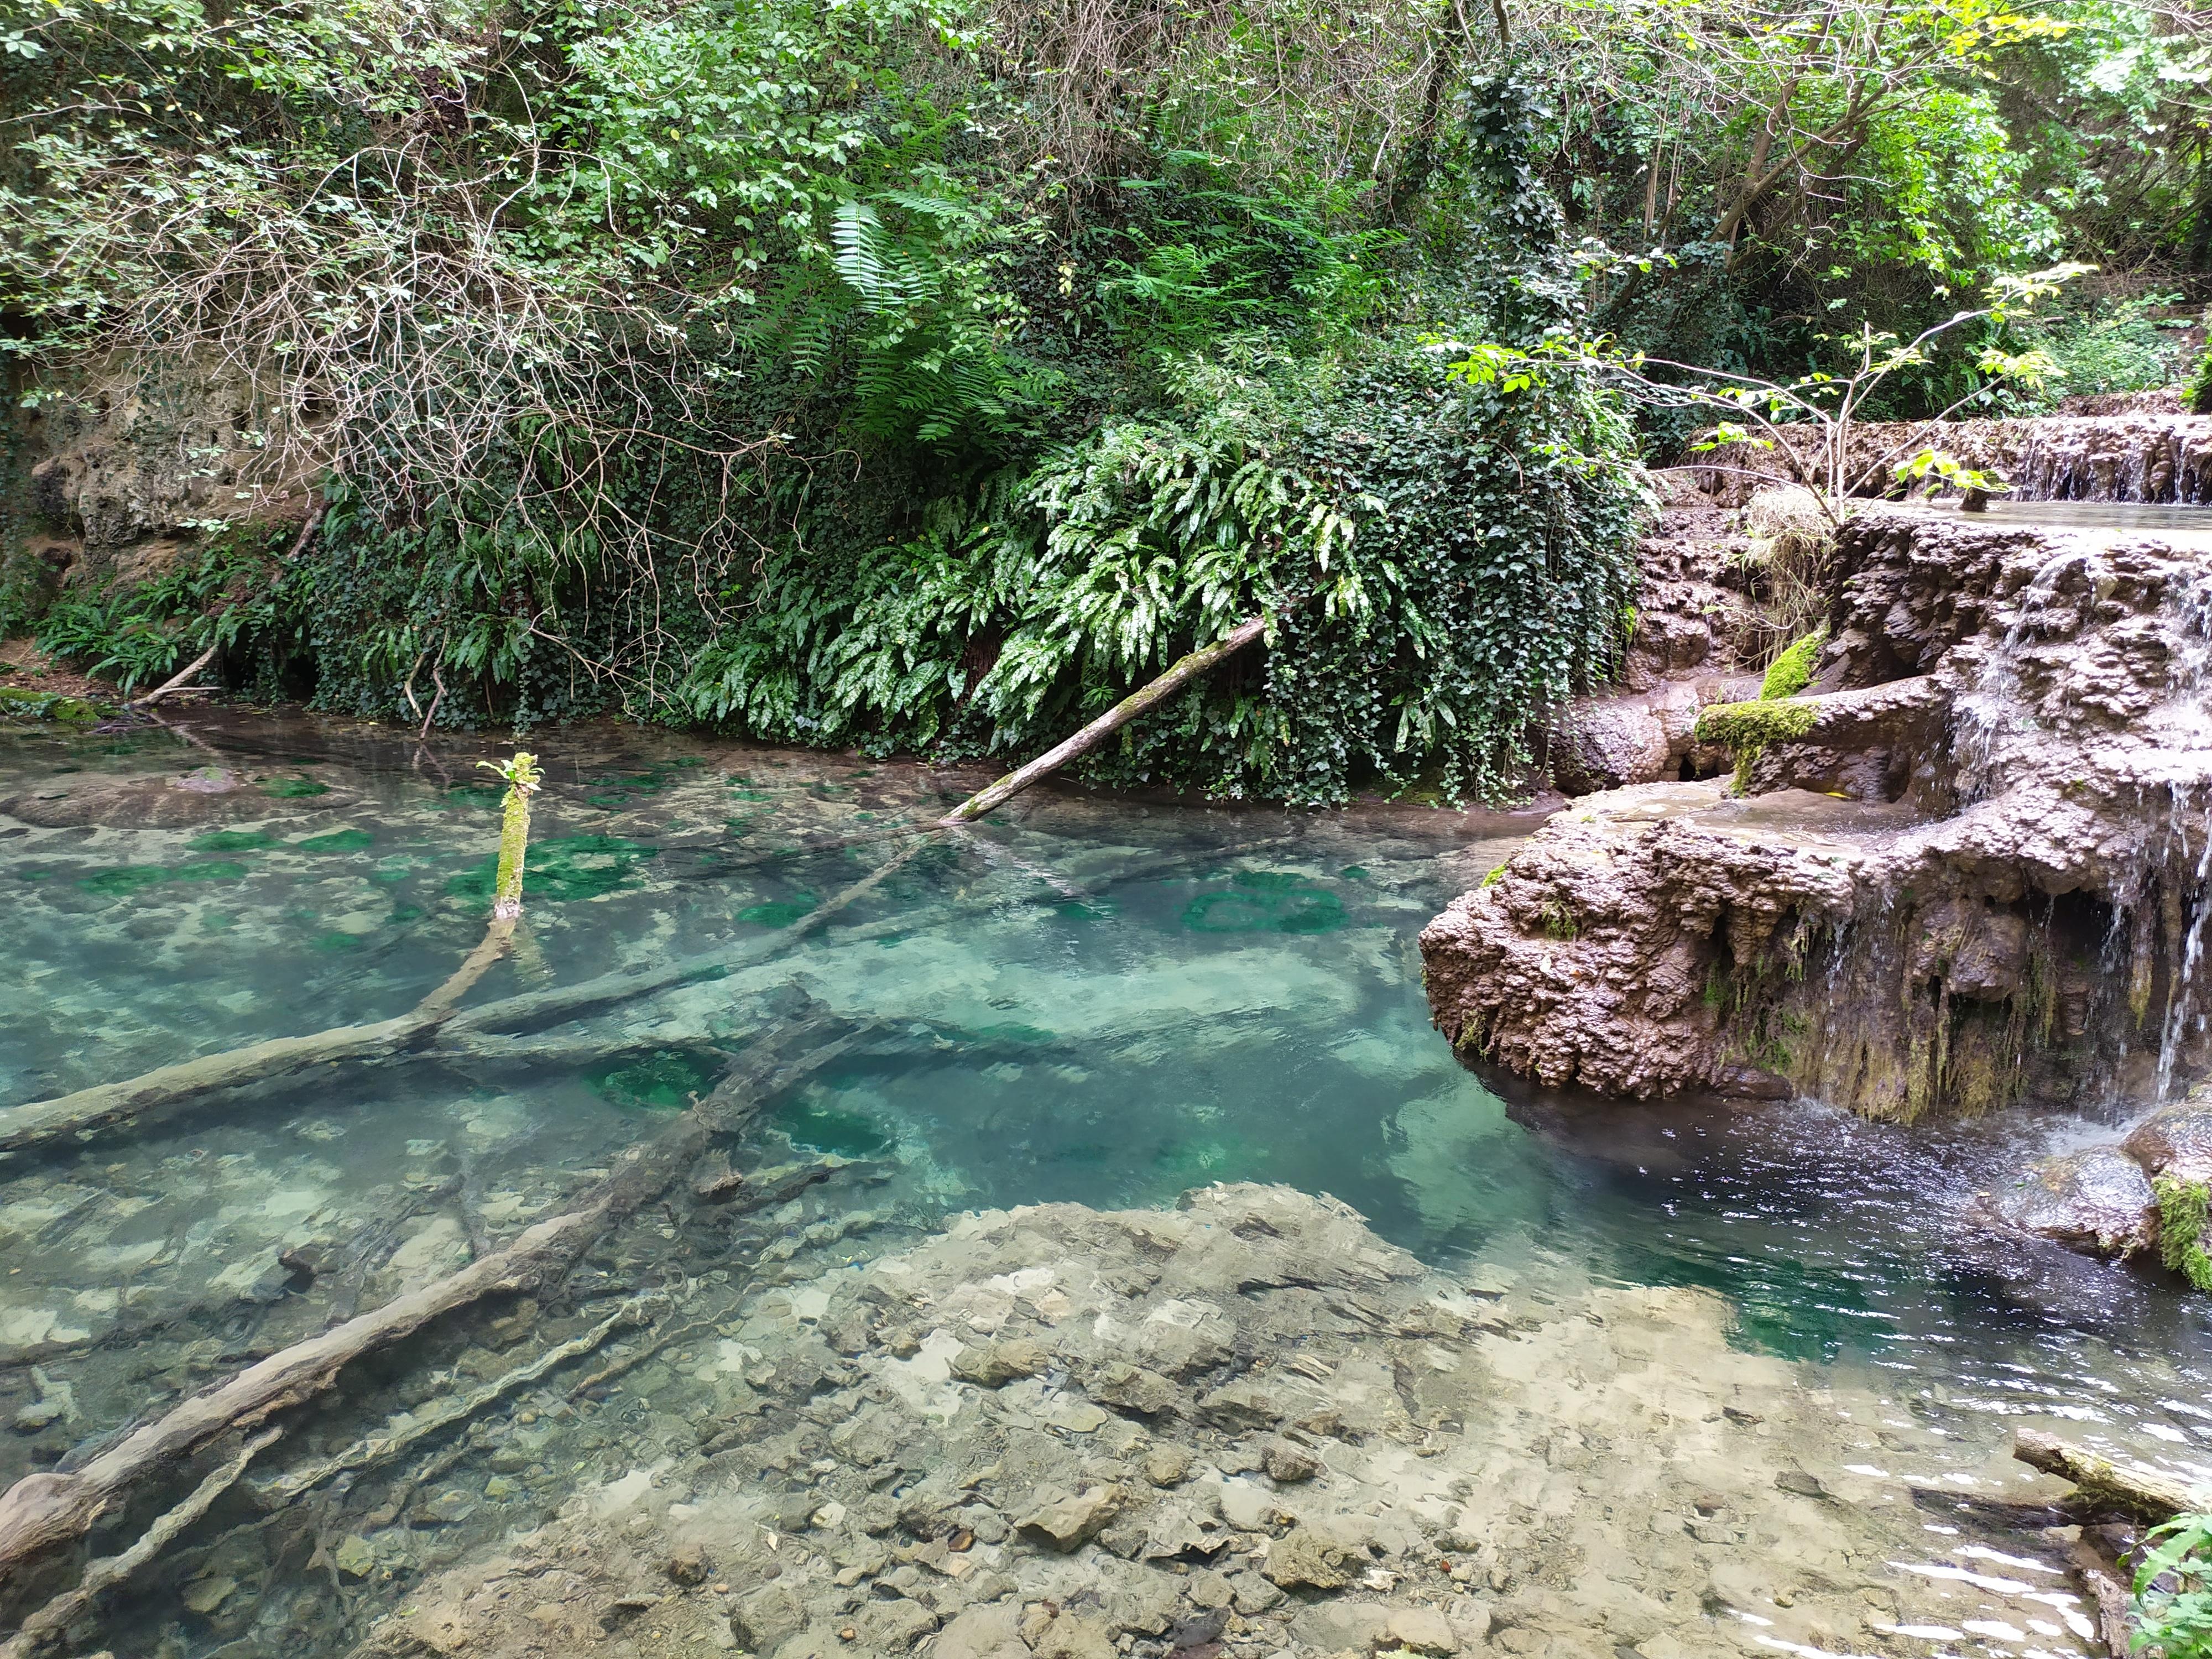 Lovech, Devetaki Cave & Krushuna Waterfalls 9